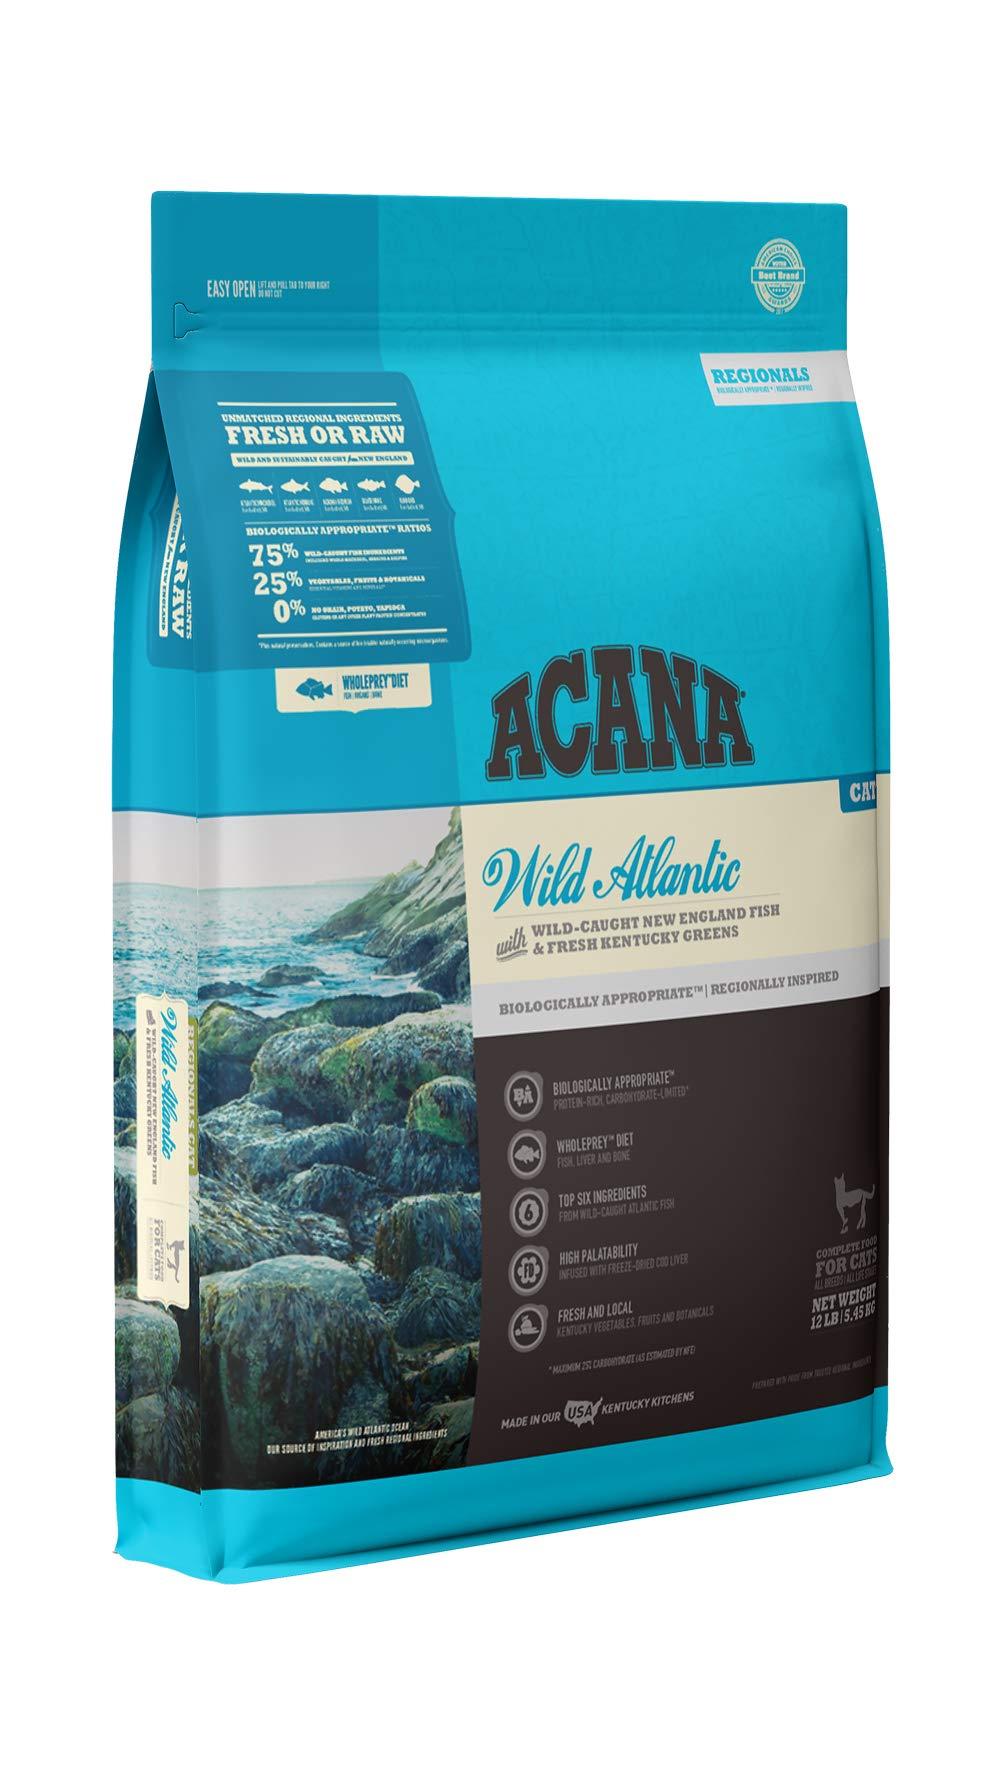 ACANA Regionals Dry Cat Food, Wild Atlantic, Biologically Appropriate & Grain Free by ACANA